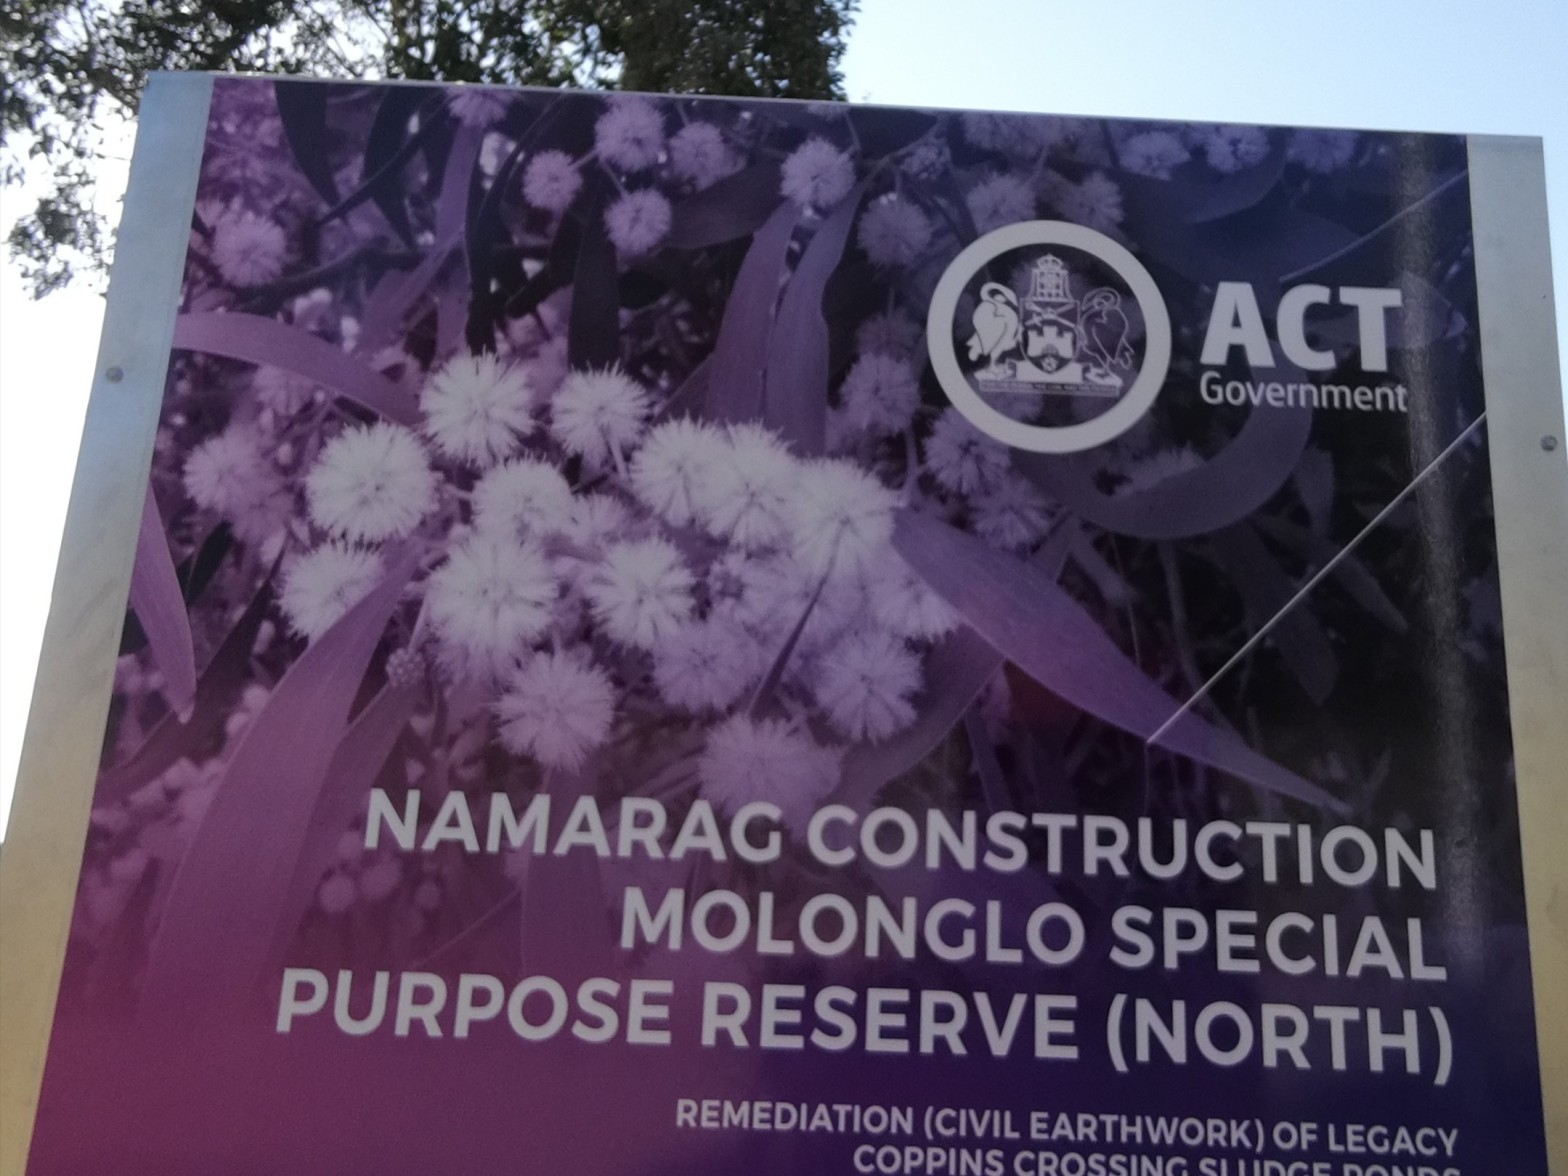 Namarag Molonglo Special Purpose Reserve